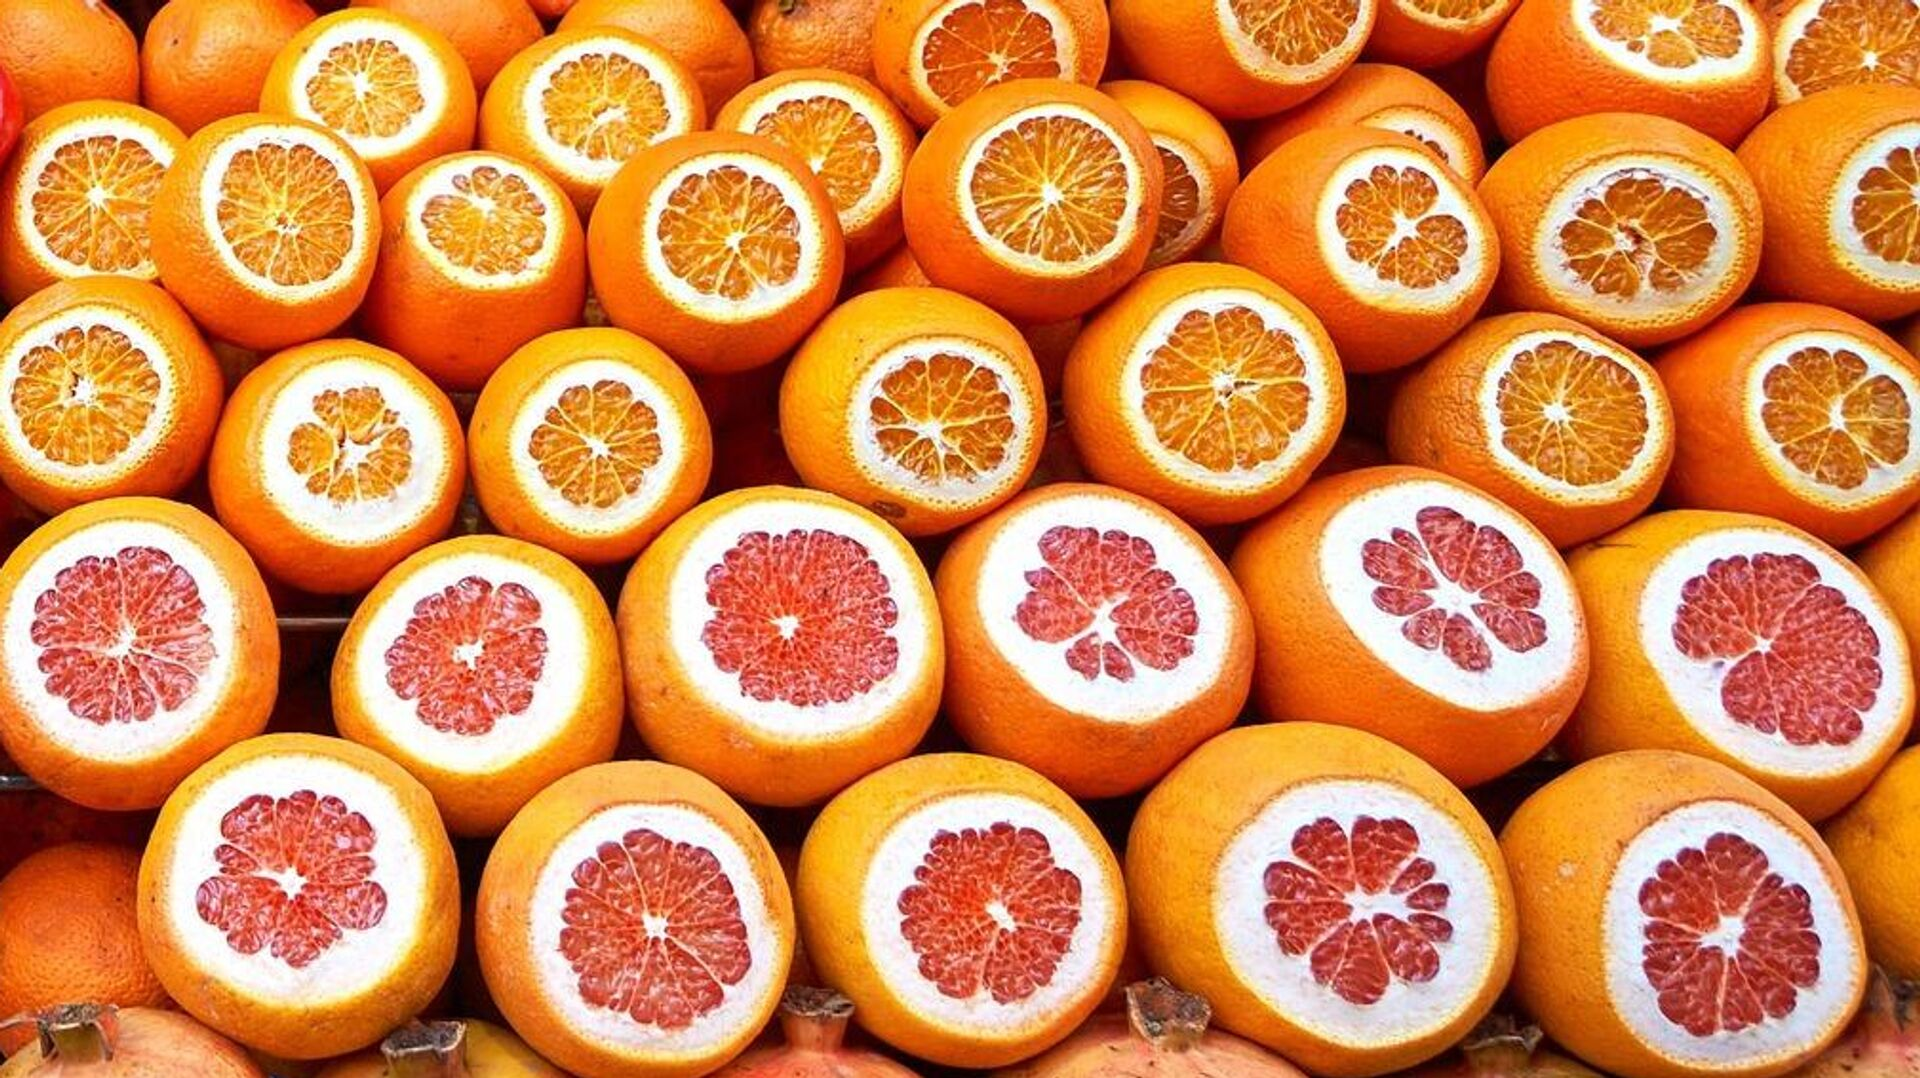 Апельсины, гранаты, грейпфруты - РИА Новости, 1920, 02.05.2021